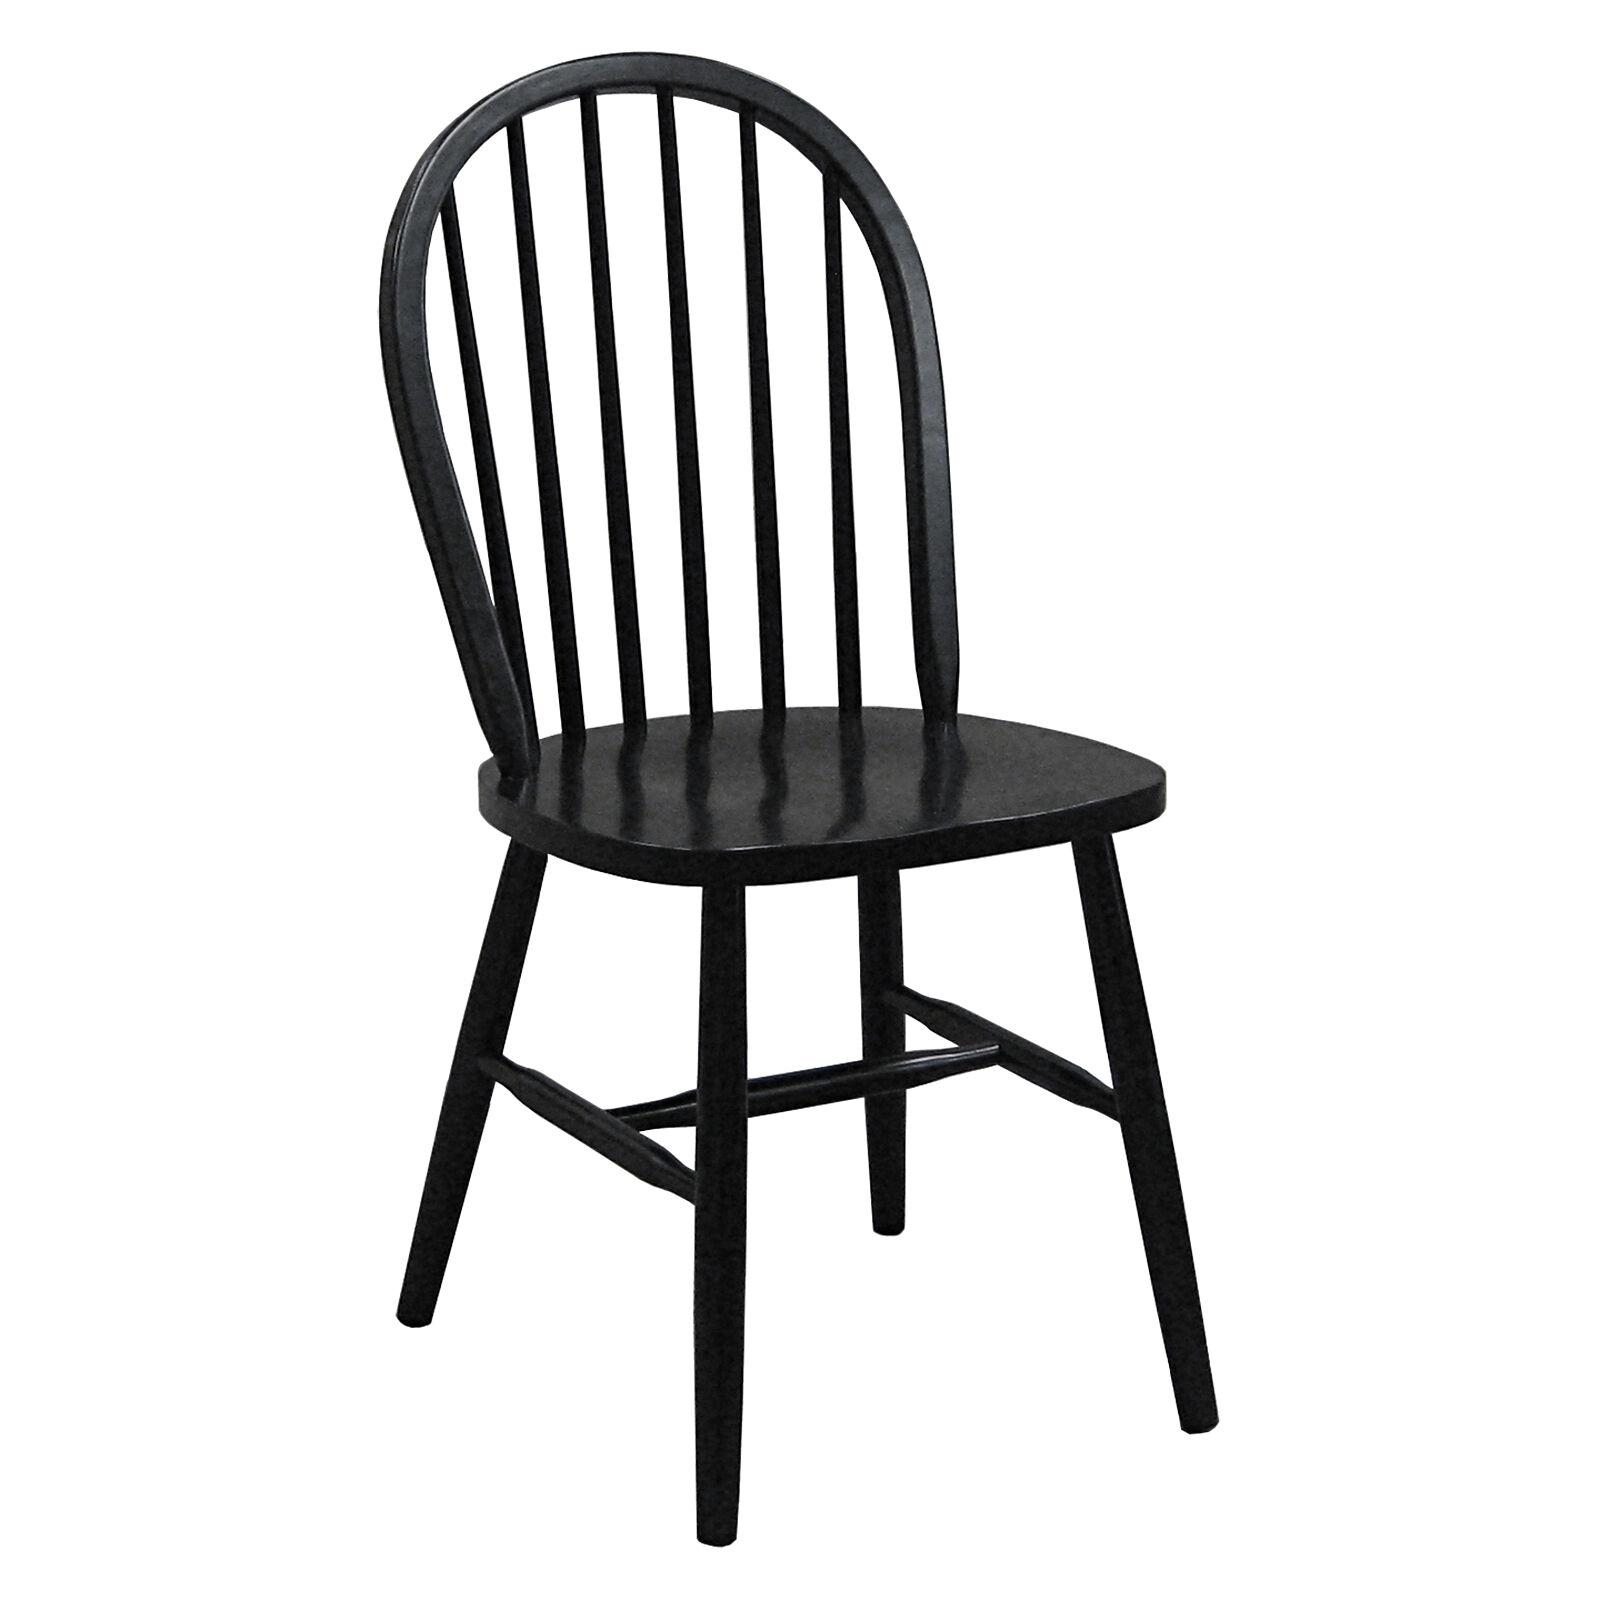 Black Windsor Chair